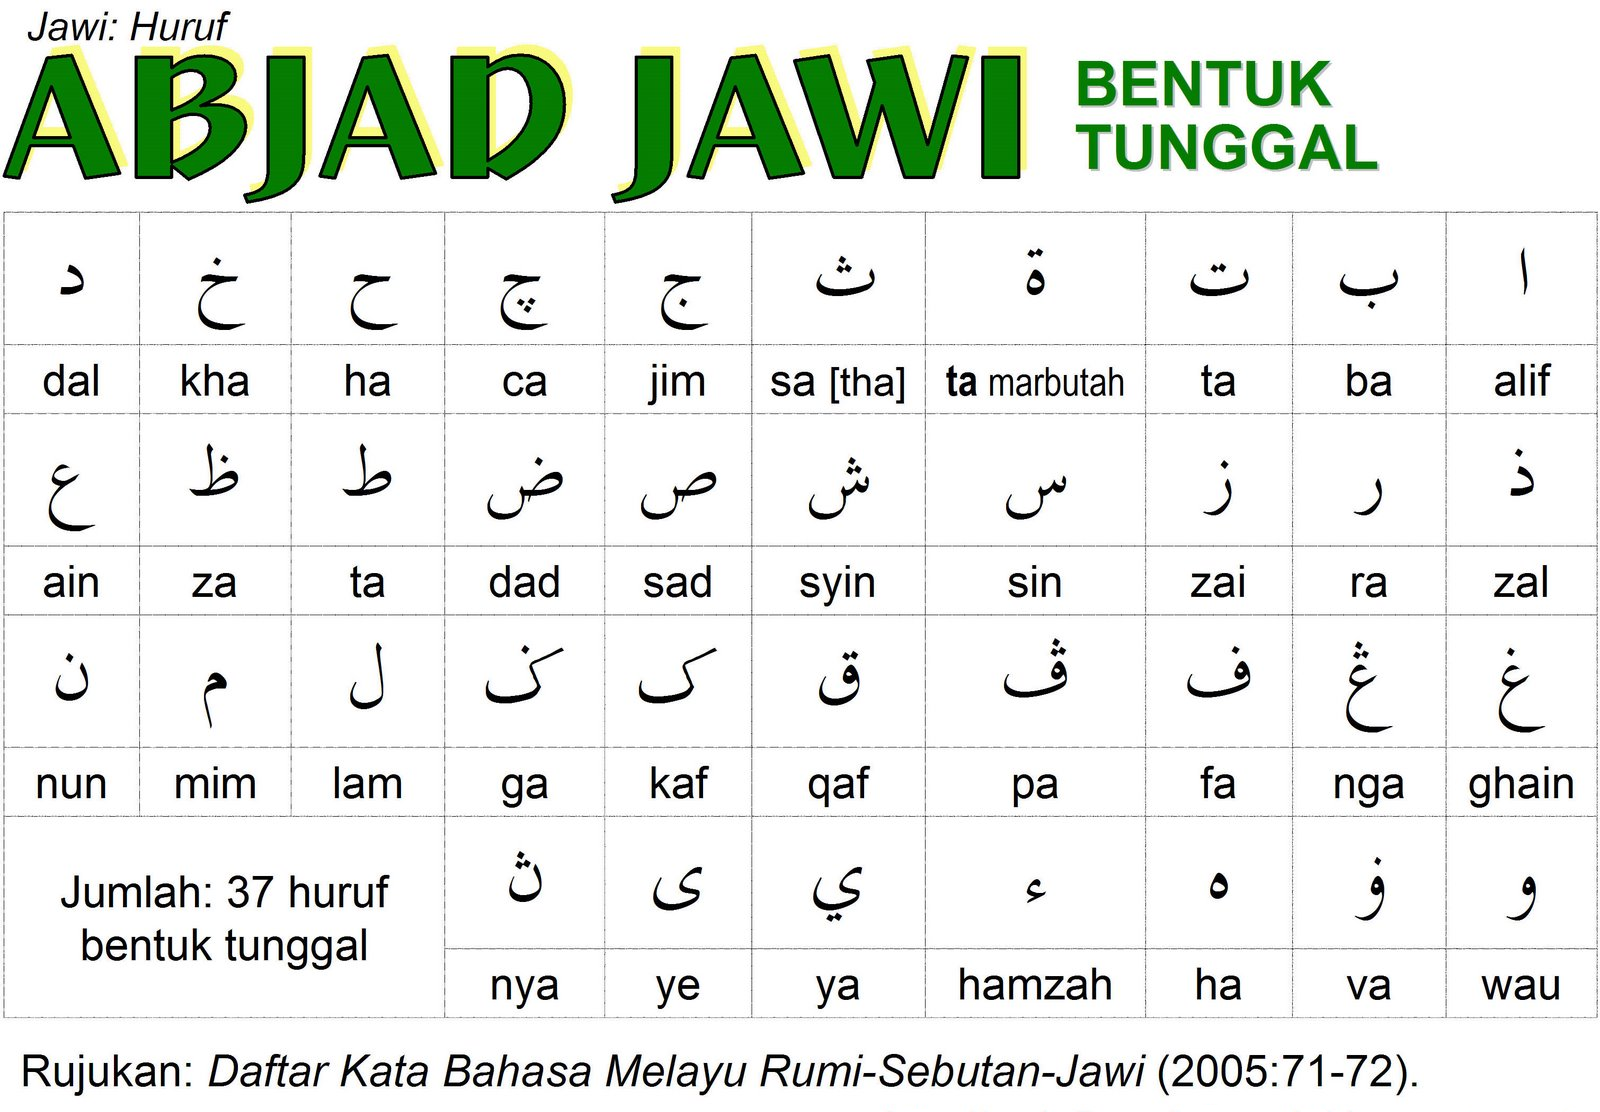 Citaten Rumi Ke Jawi : Julia yacub huruf jawi tunggal